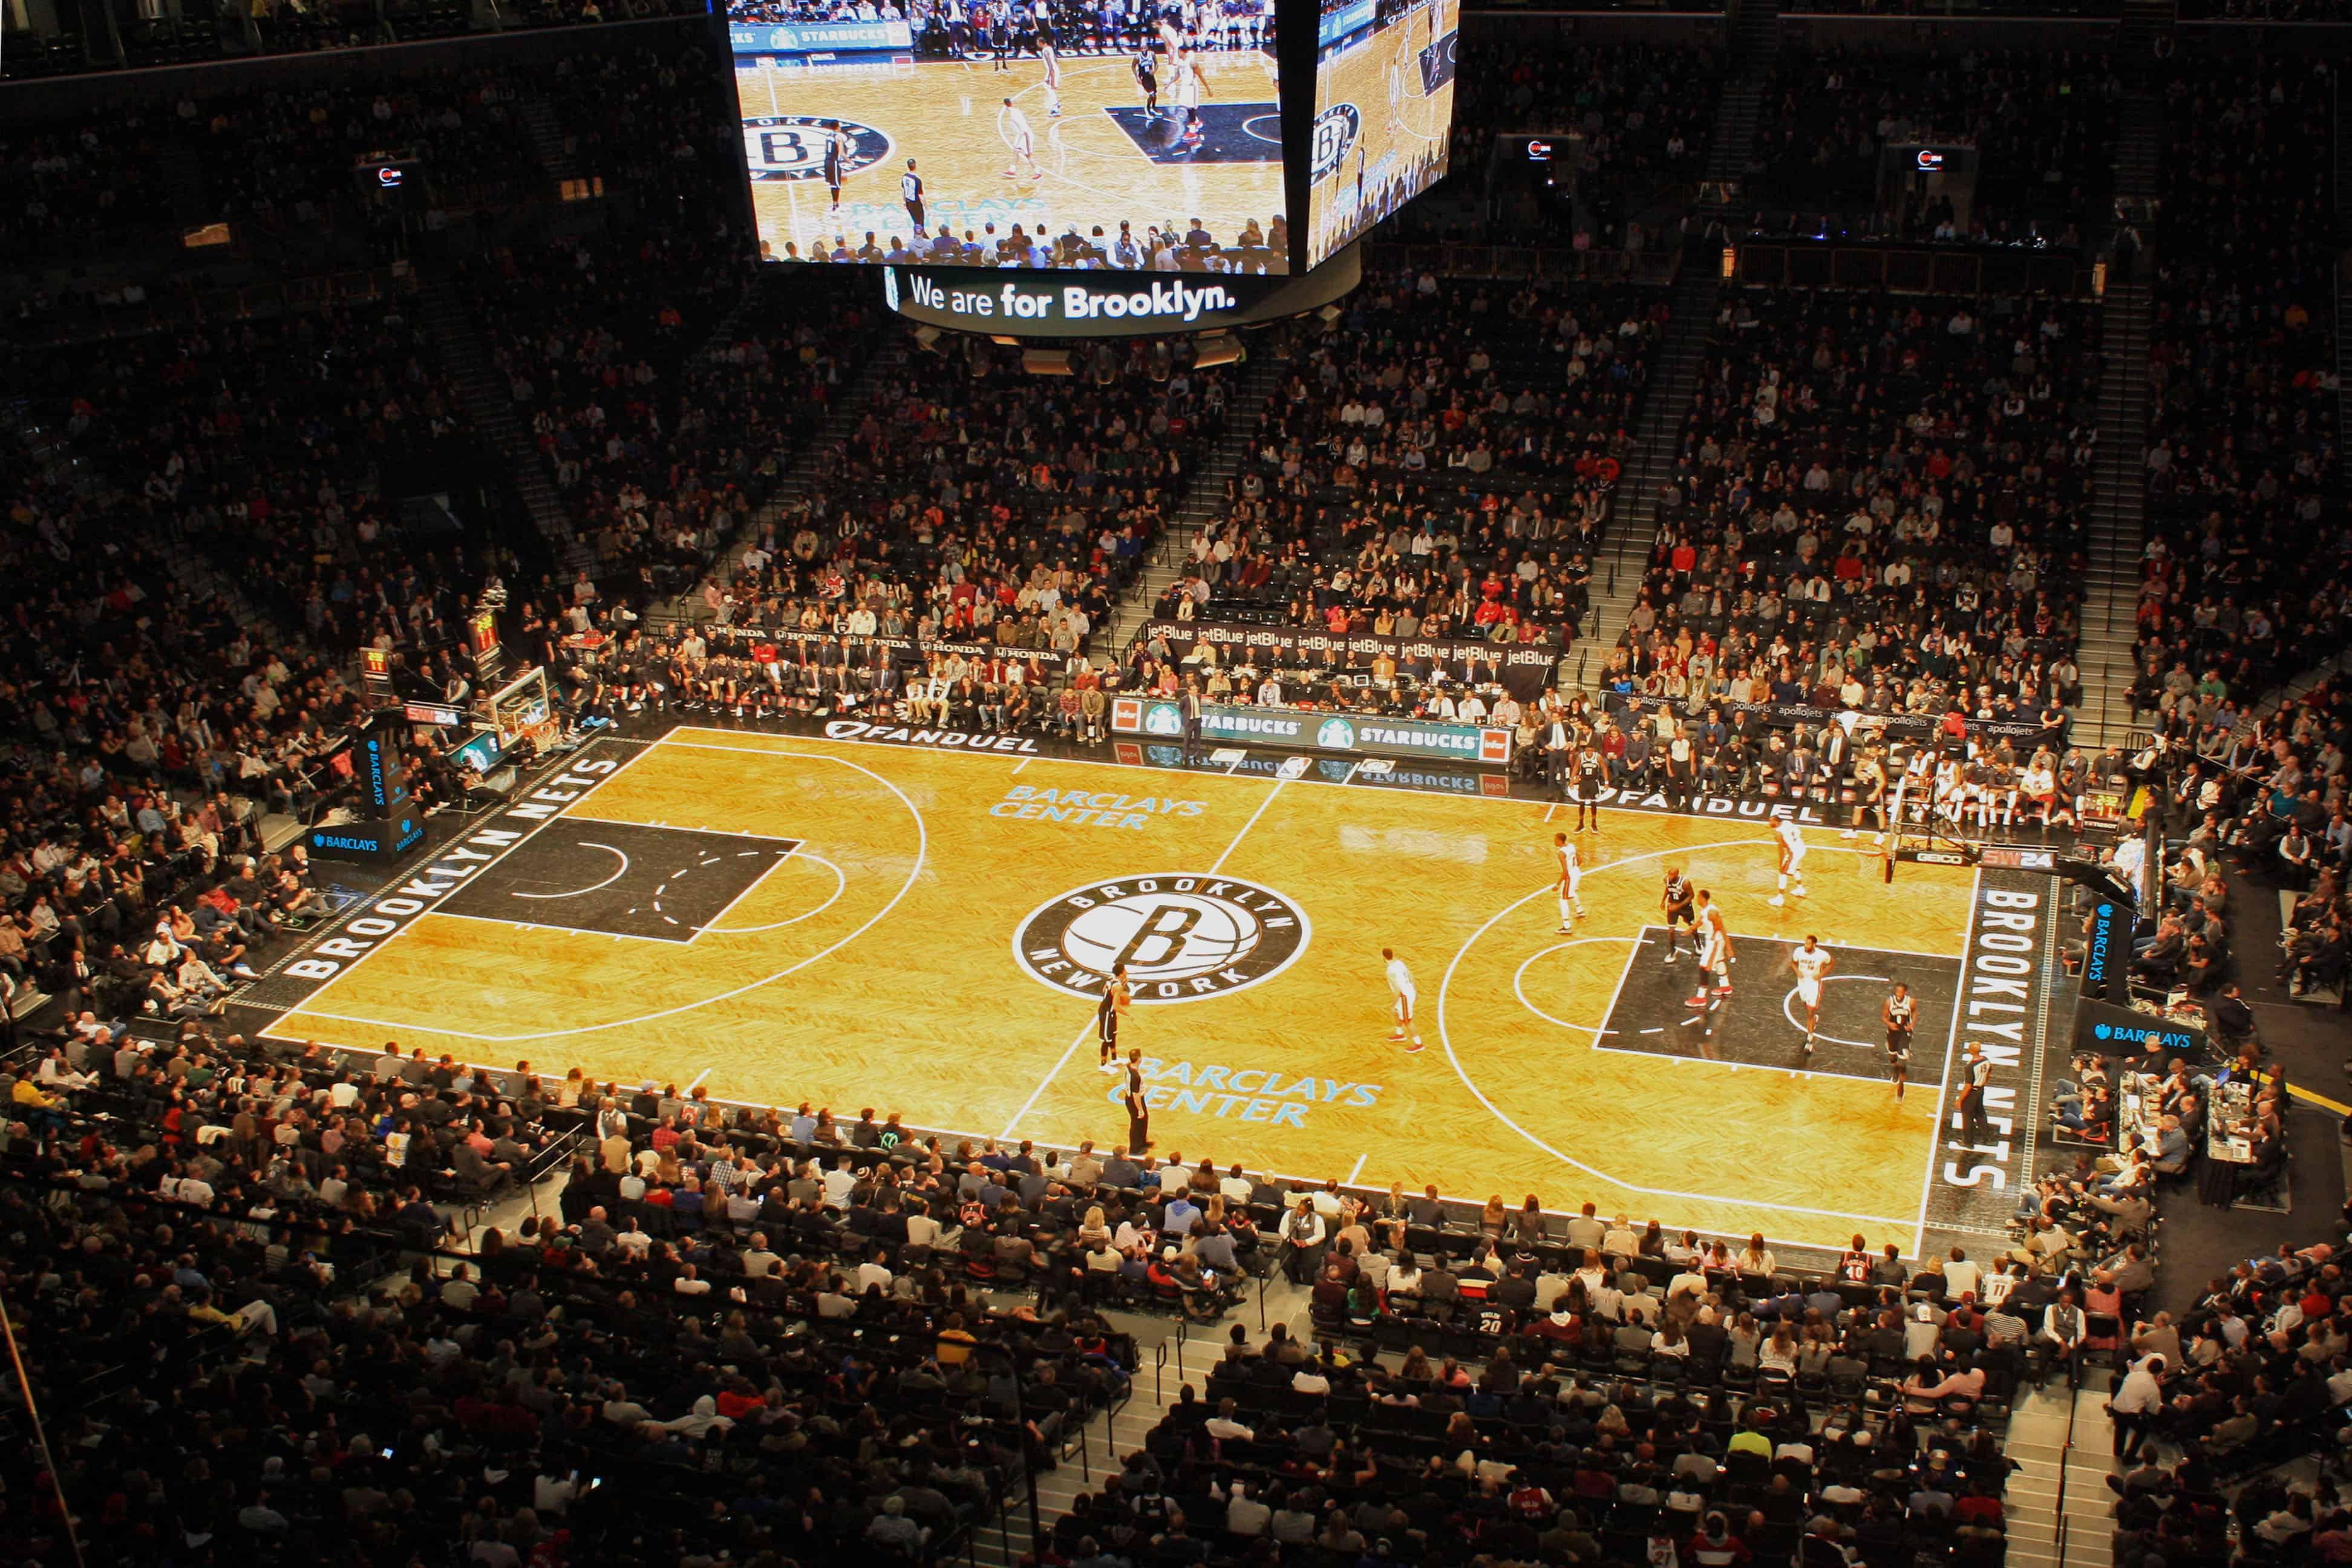 Miami Heat vs Brooklyn Nets at Barclays Centre